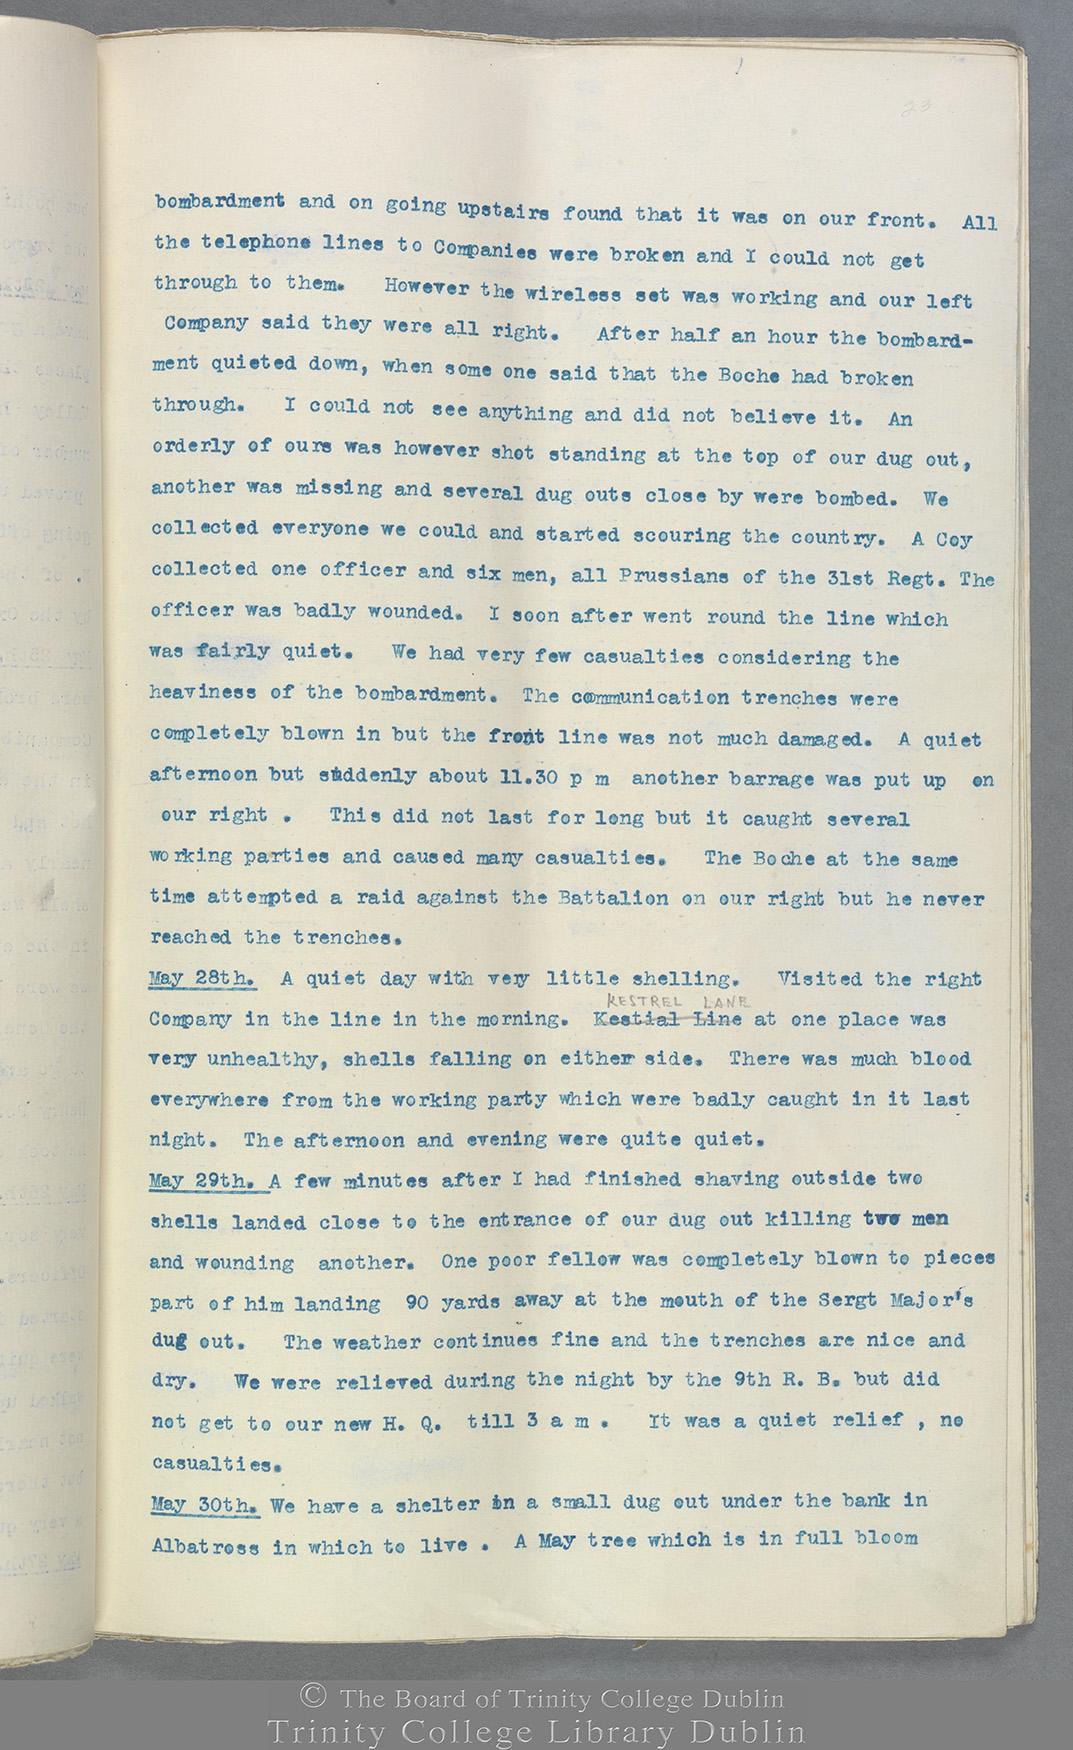 TCD MS 10822 folio 23 recto